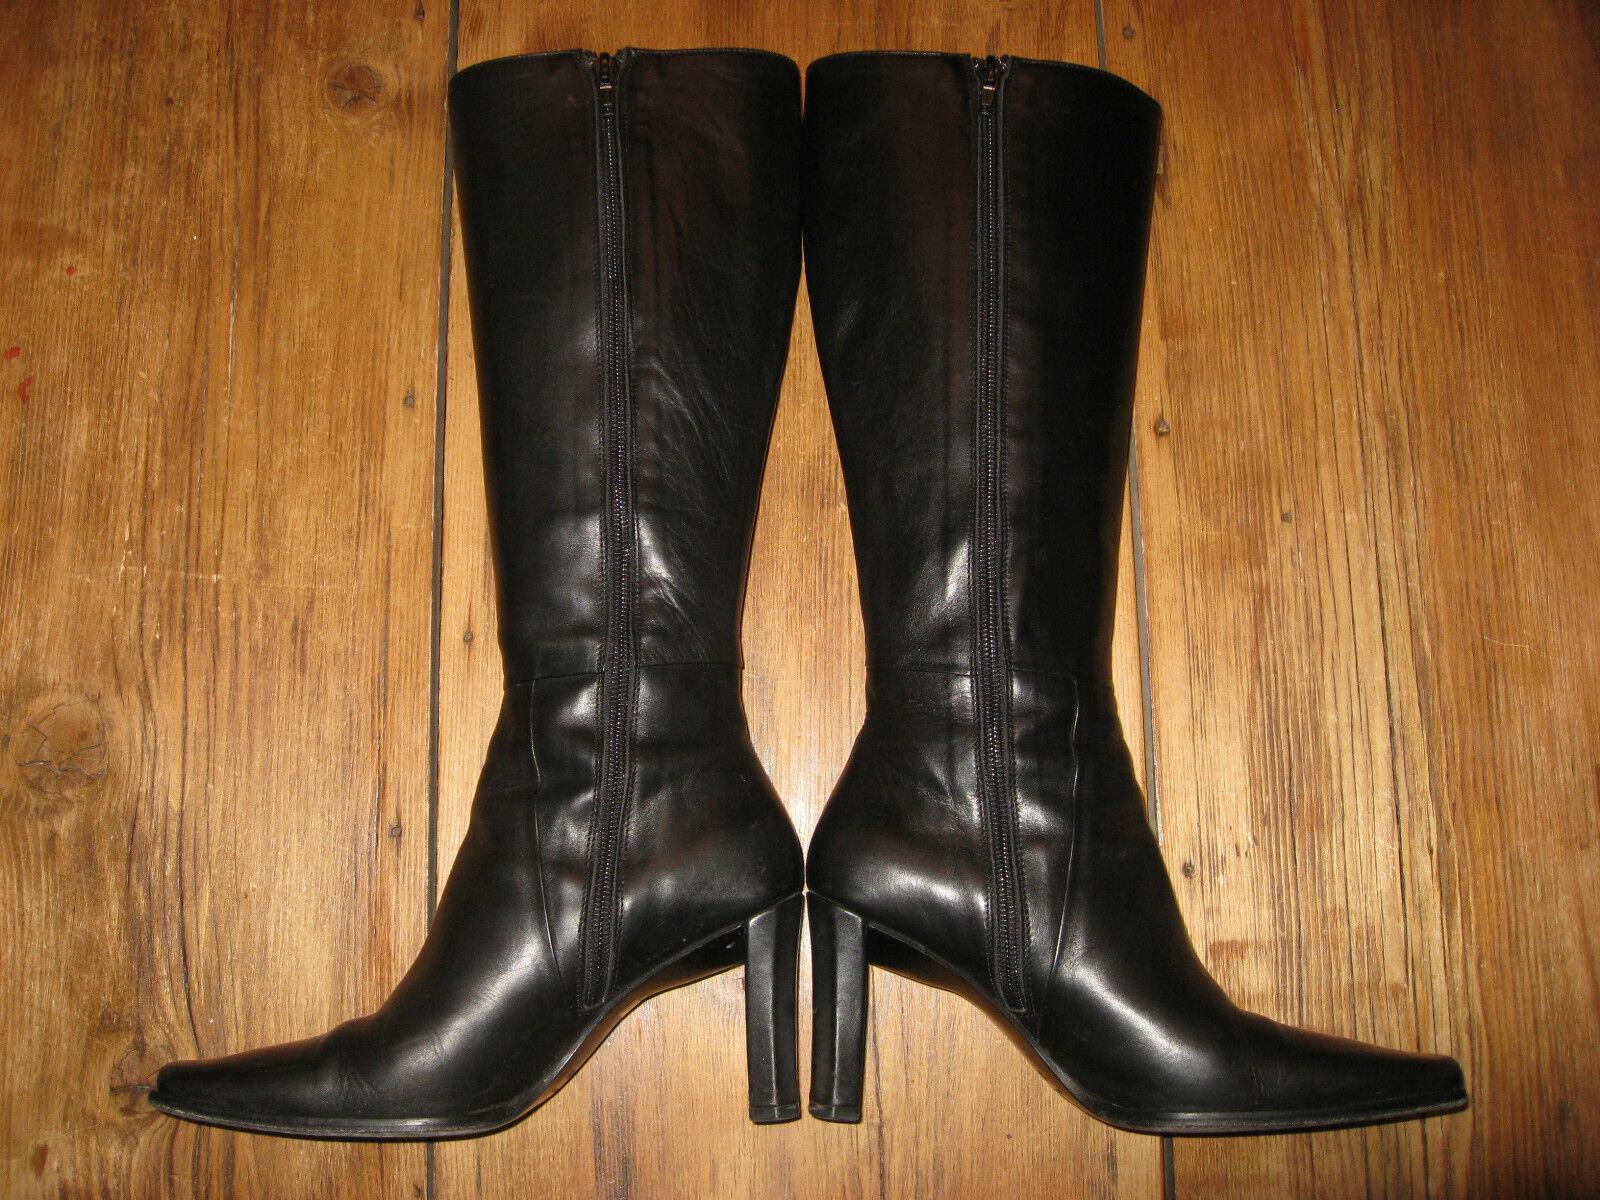 Charles David botas De Cuero Negro Talla 5.5 de alto EUC estilo zanny al por menor  315 EUC alto e201da